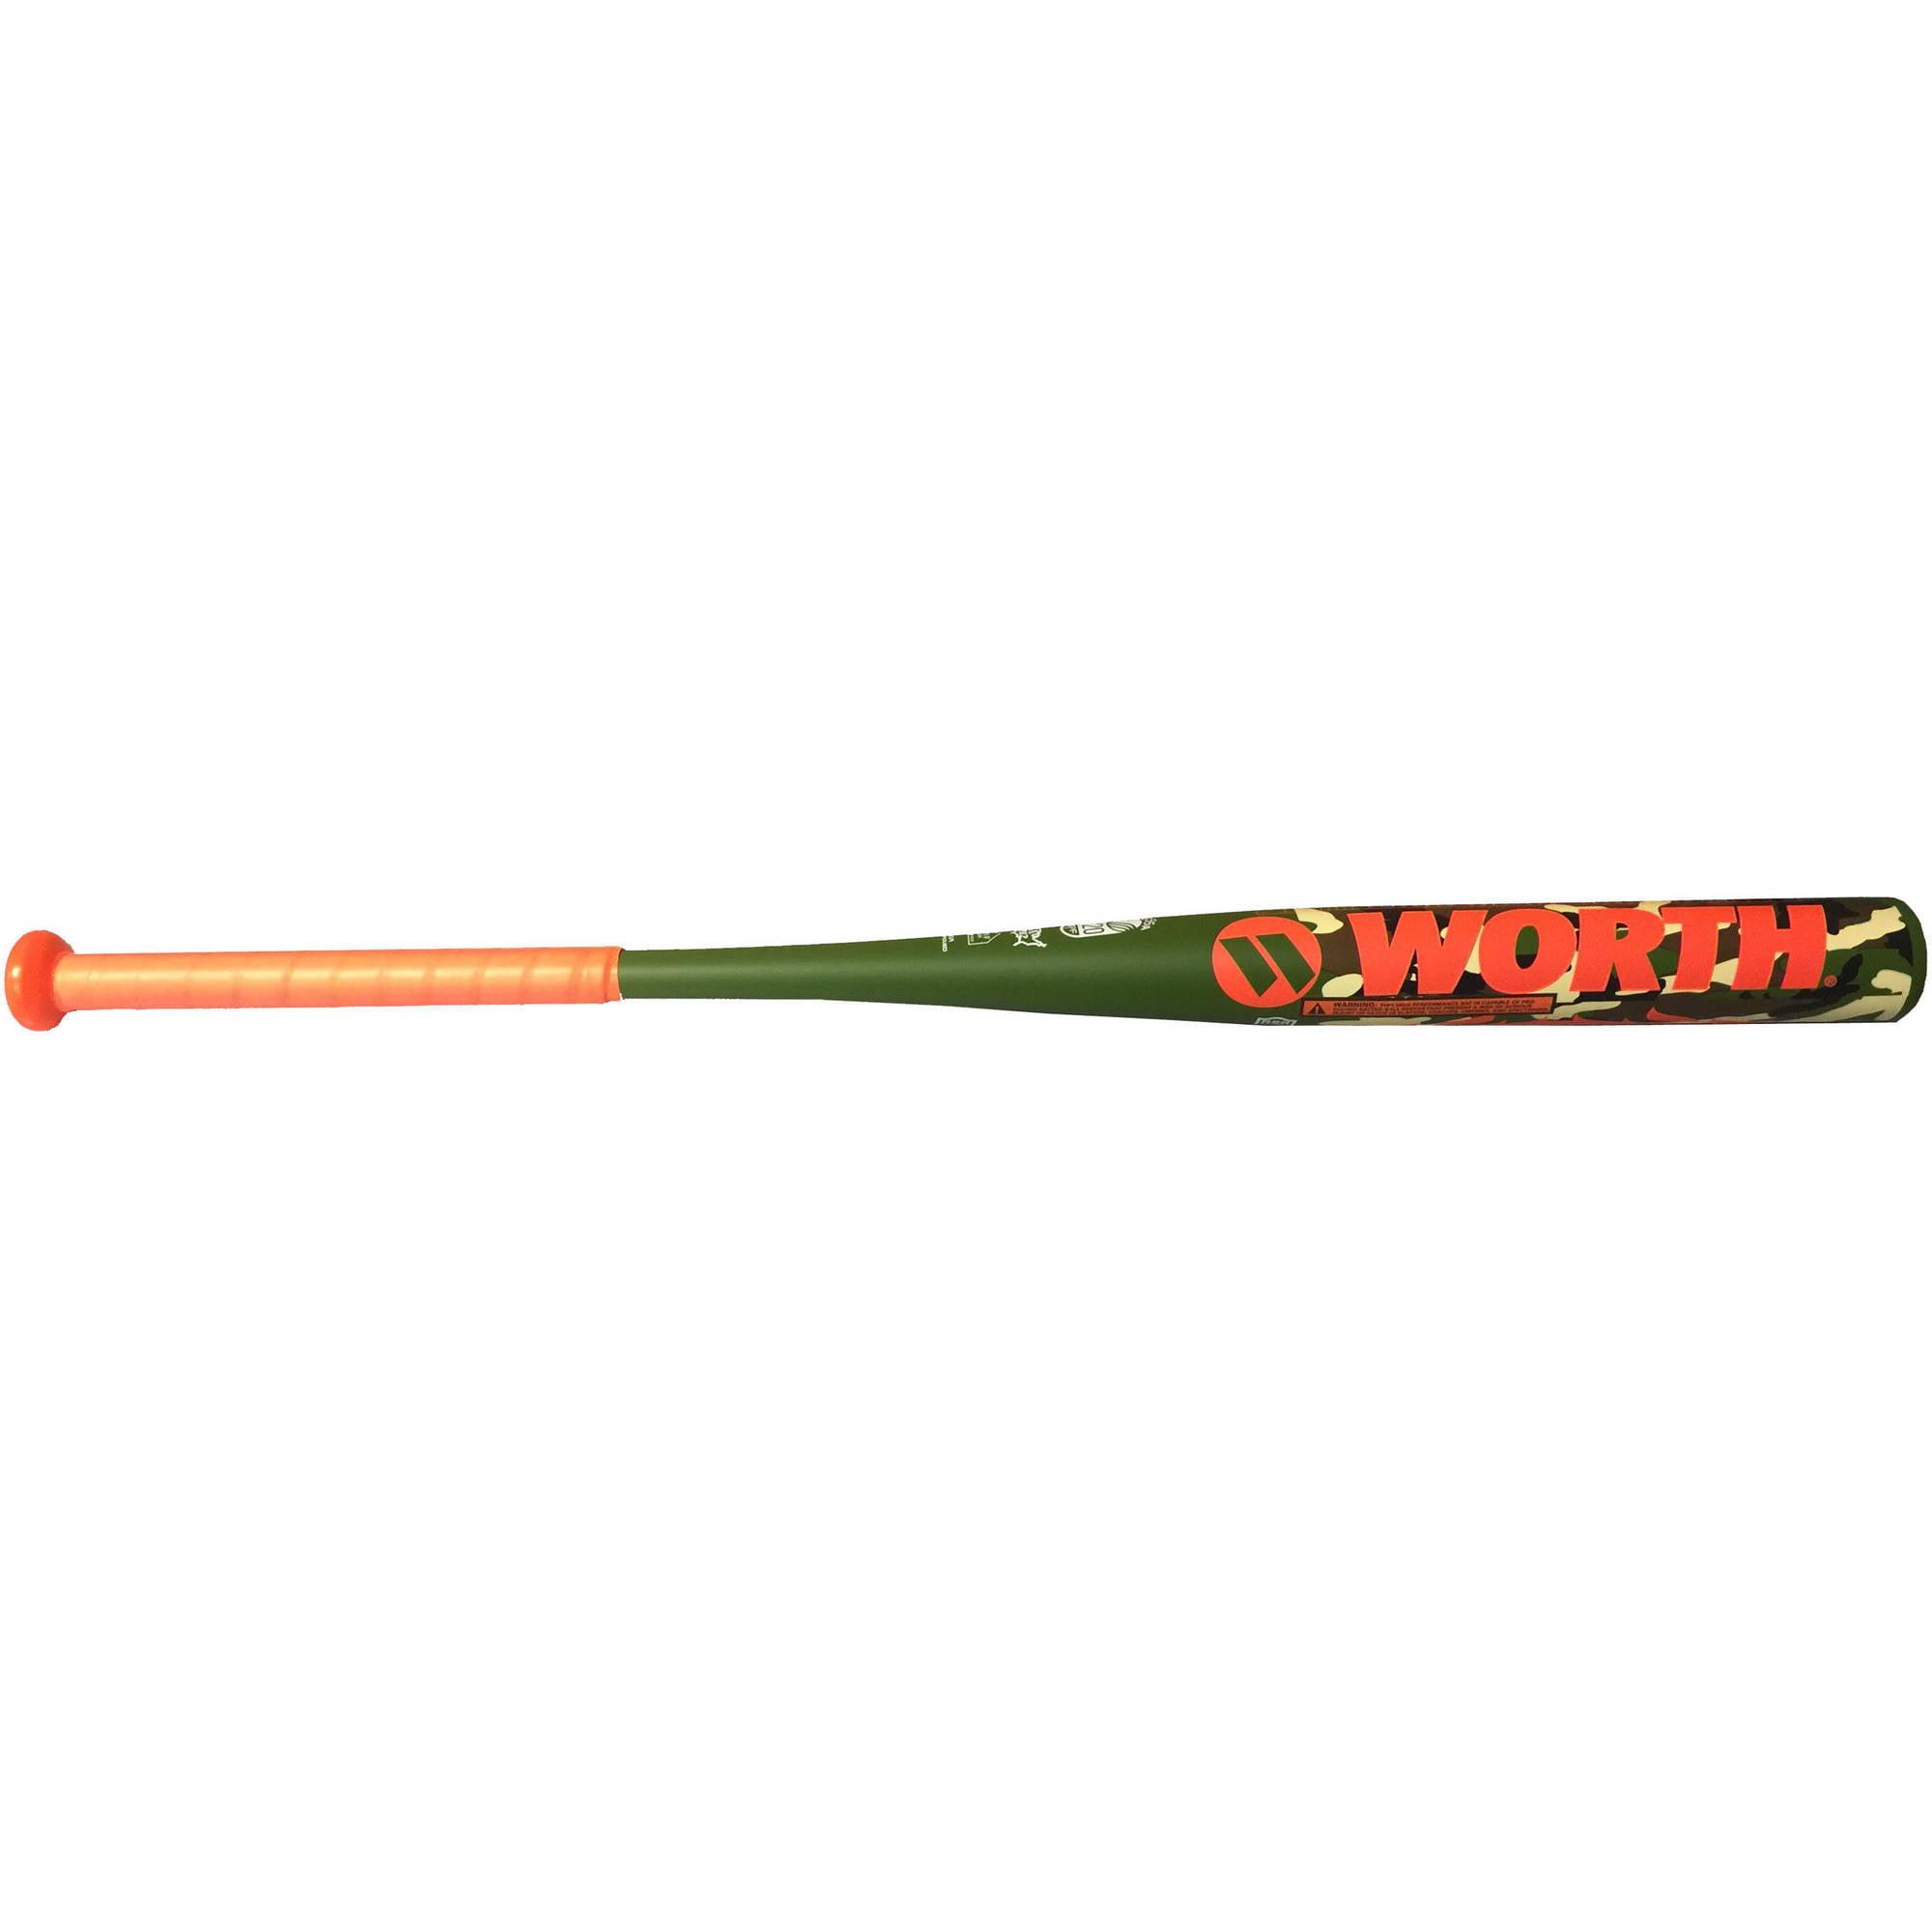 worth amp camo slowpitch softball bat 34 26 5oz walmart